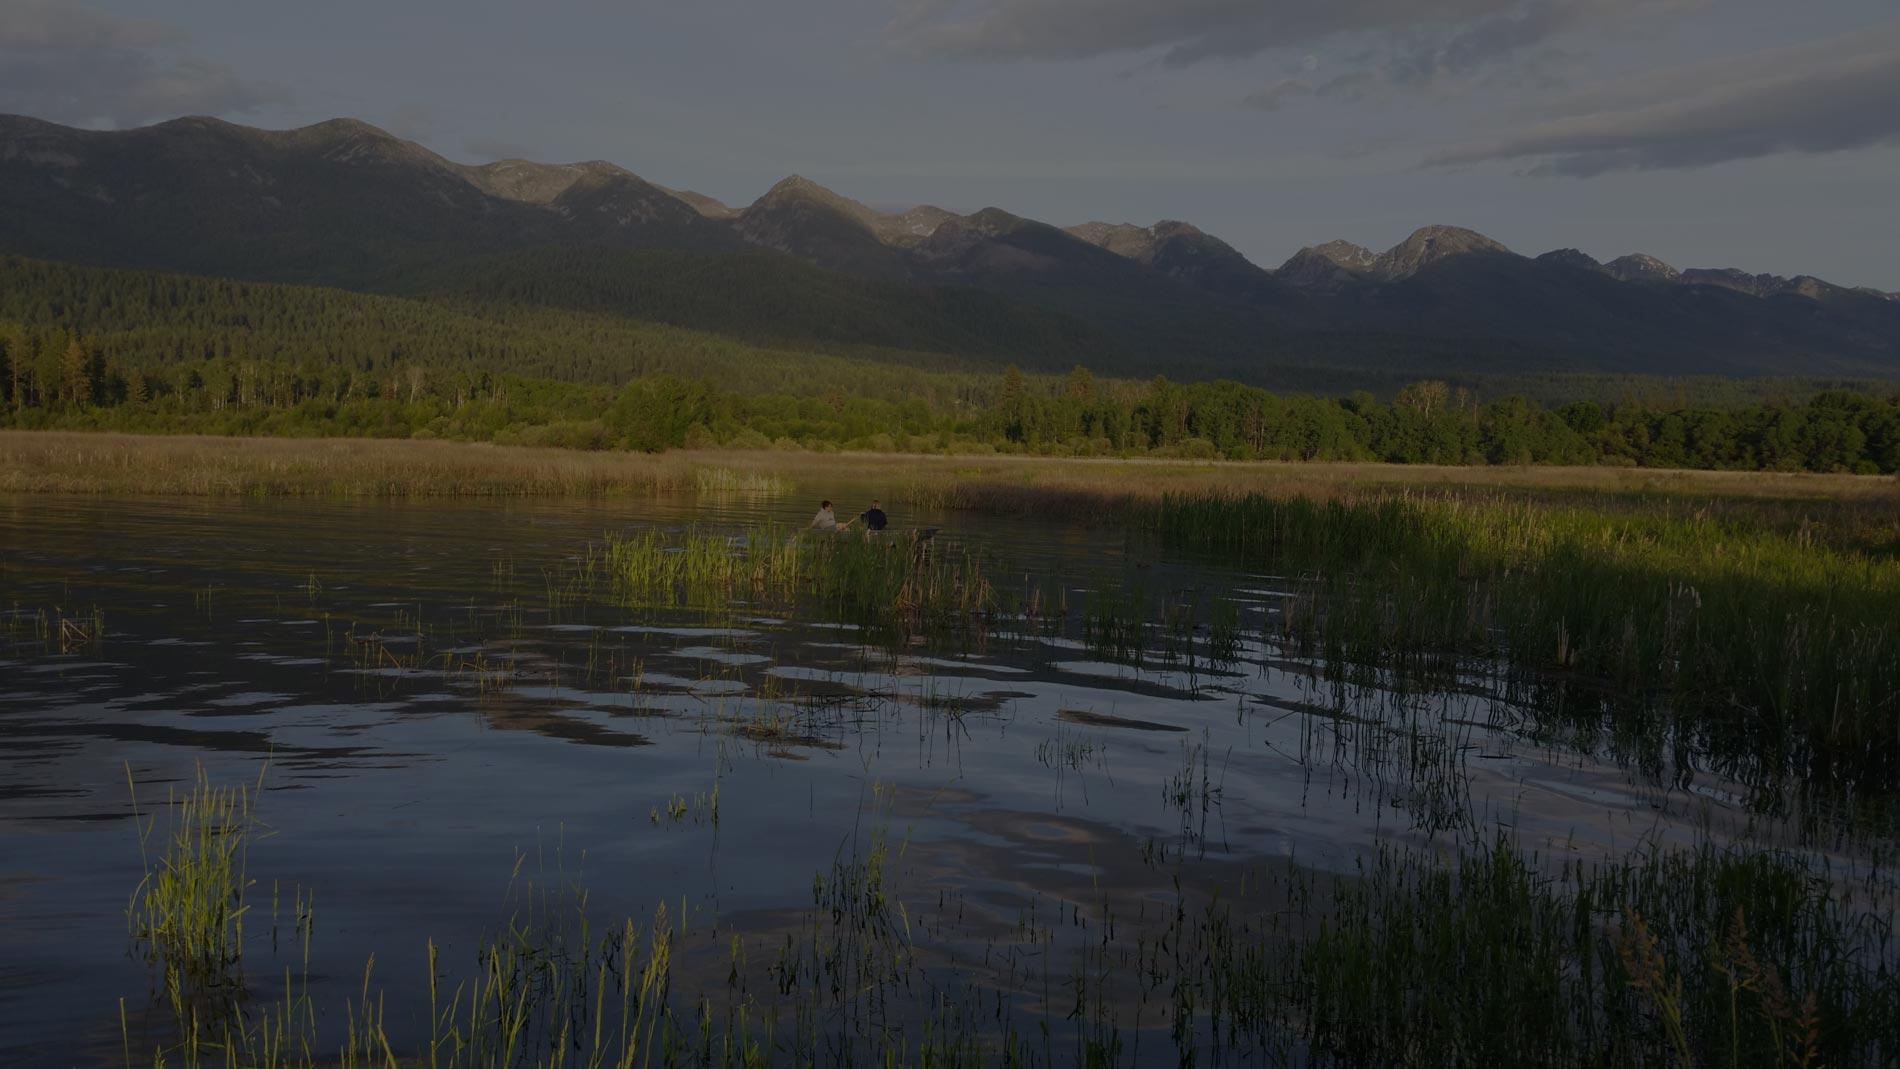 Flathead Lake Fishing Access